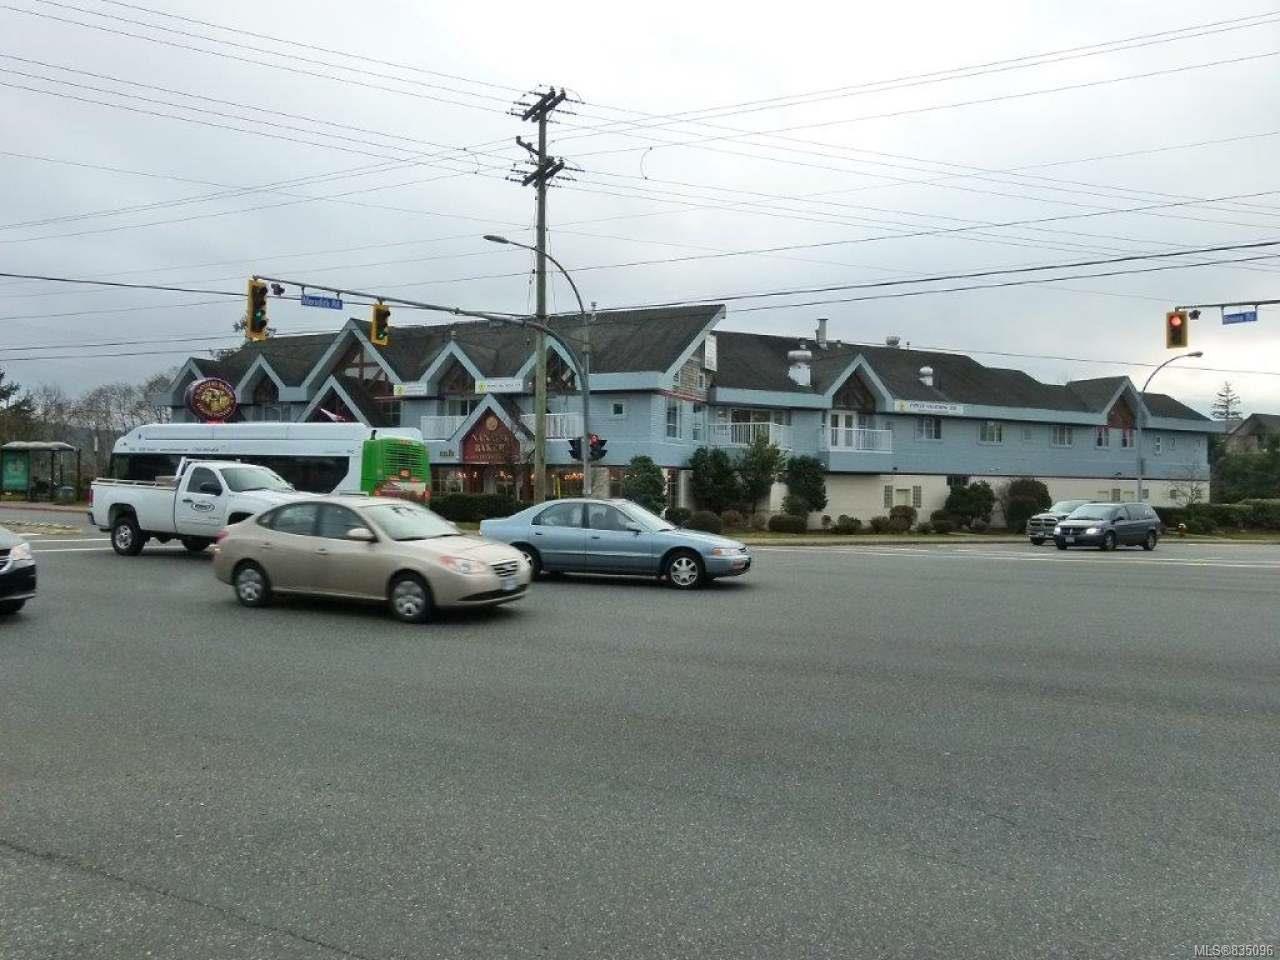 Photo 3: Photos: 2025 Bowen Rd in NANAIMO: Na Central Nanaimo Mixed Use for sale (Nanaimo)  : MLS®# 835096